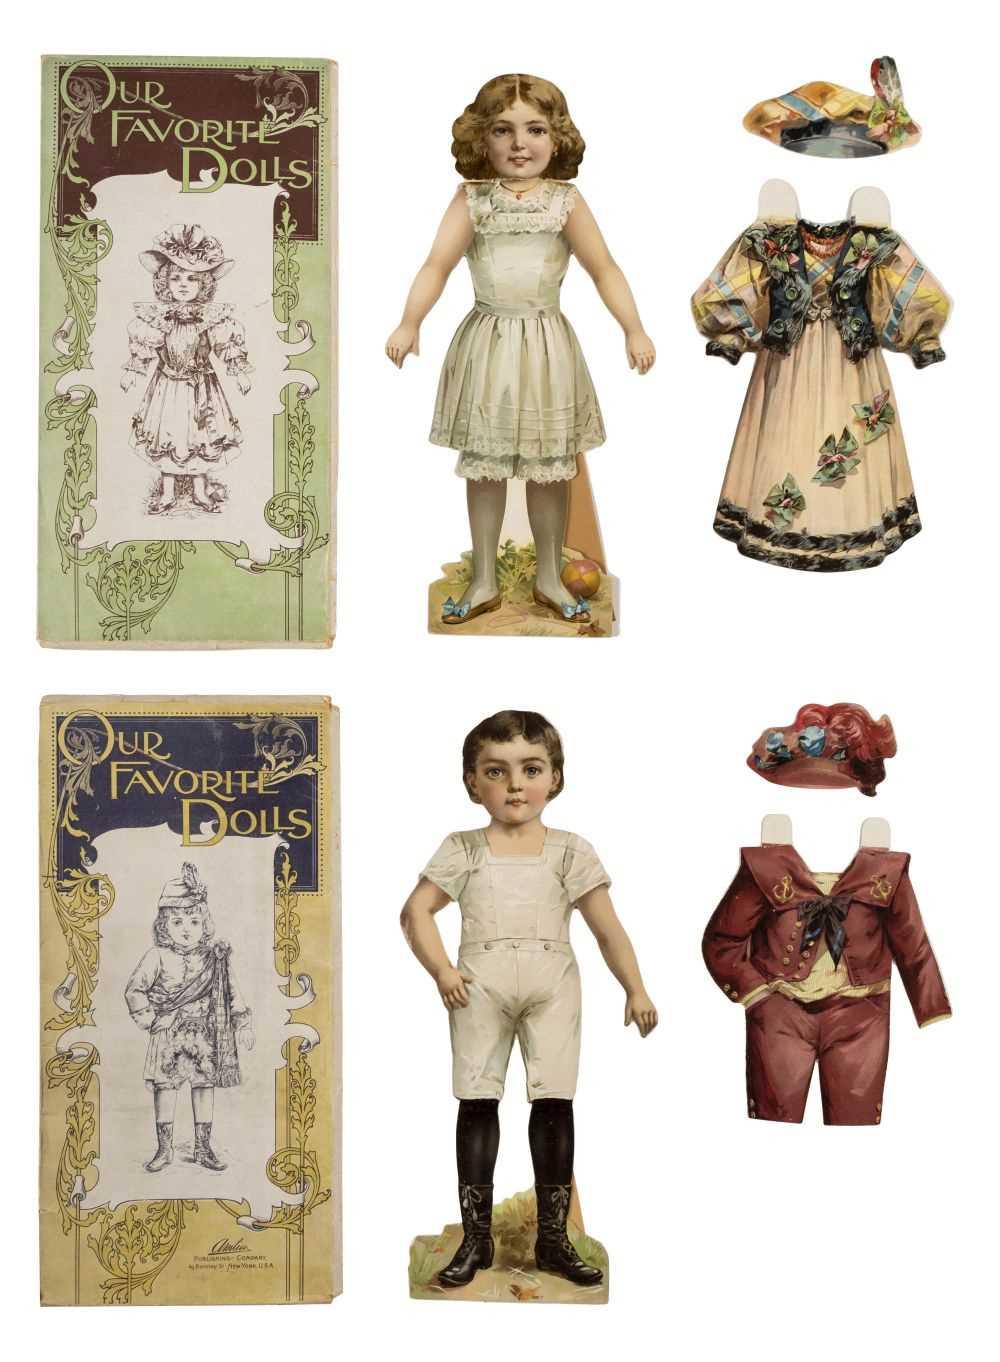 Lot 541-Paper dolls. Our Favorite Dolls, circa1890s